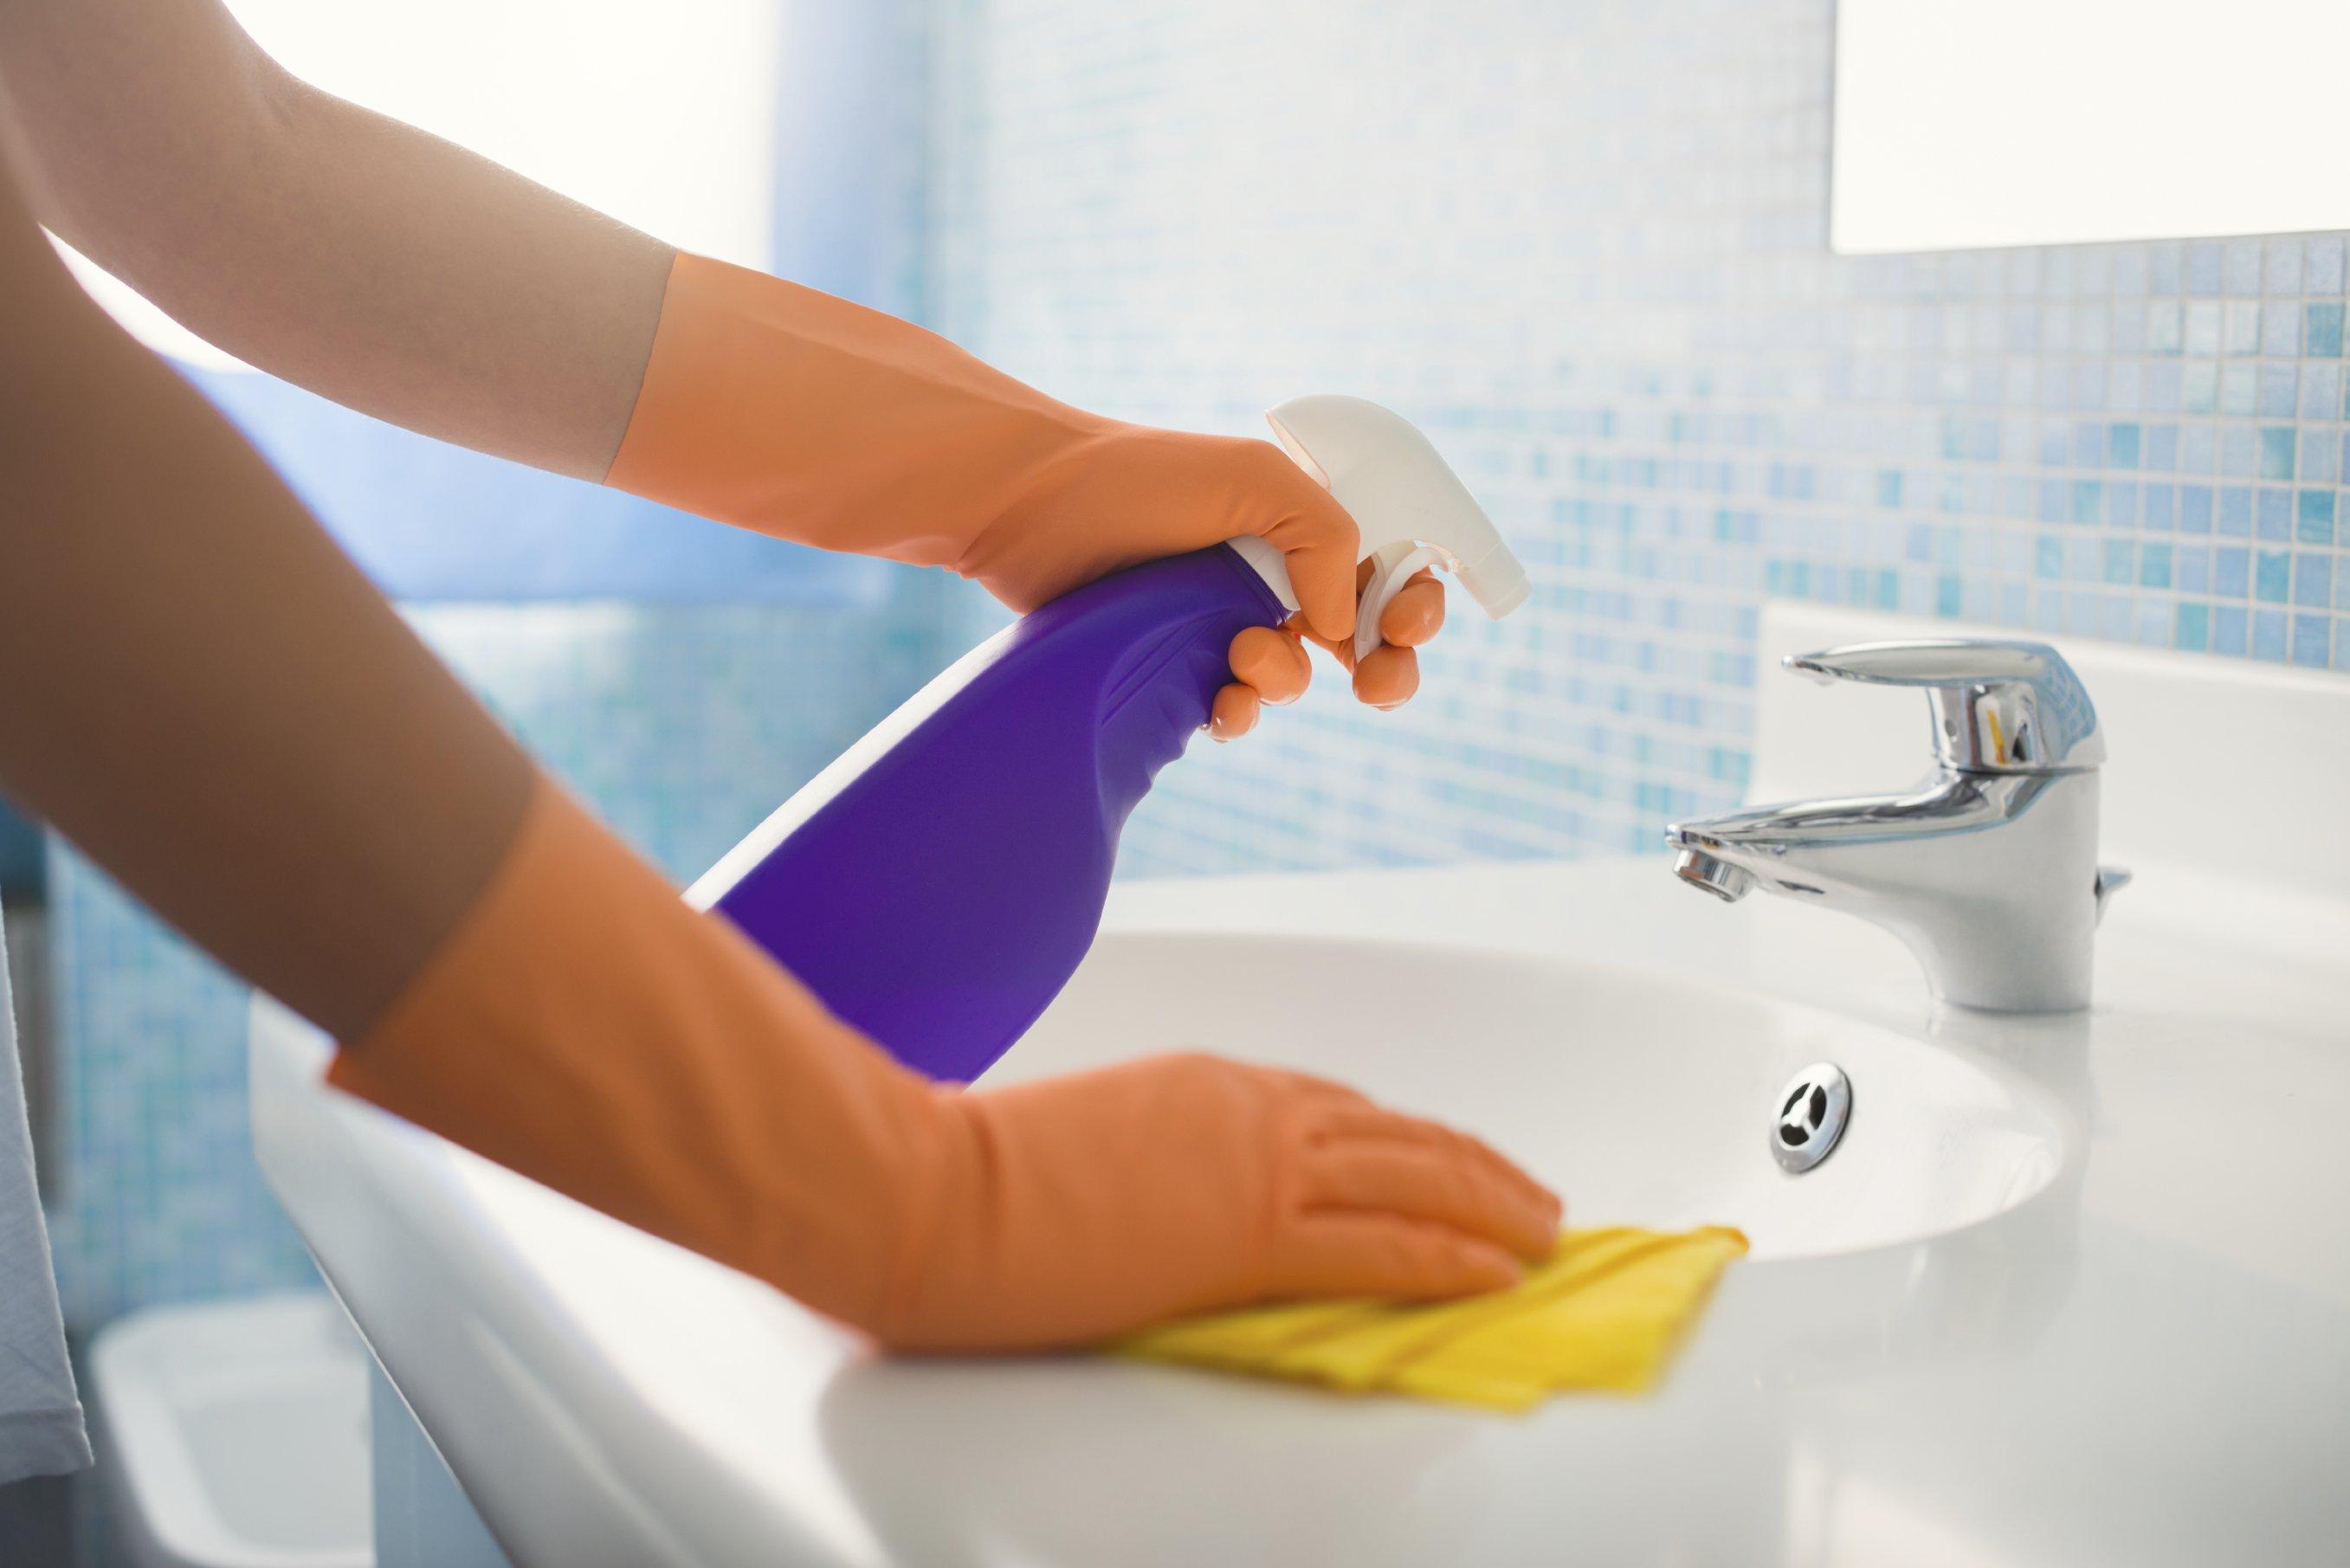 Remodelaholic | How to Clean a Bathroom Using Clorox Bleach